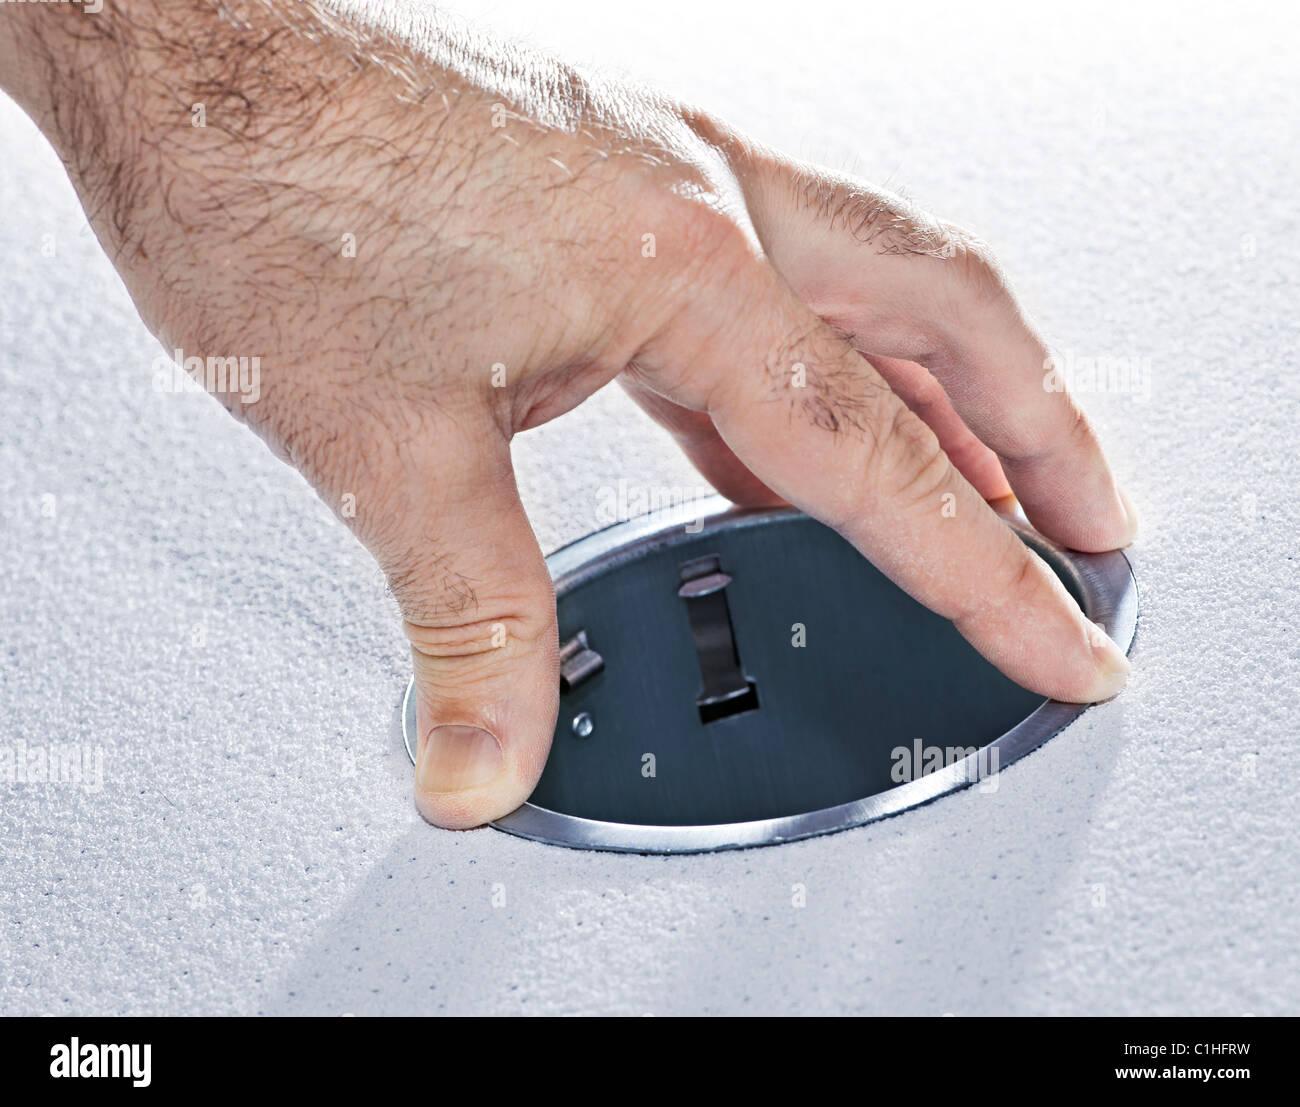 Hands Installing Round Metal Pot Light Fixture Into Ceiling Tile